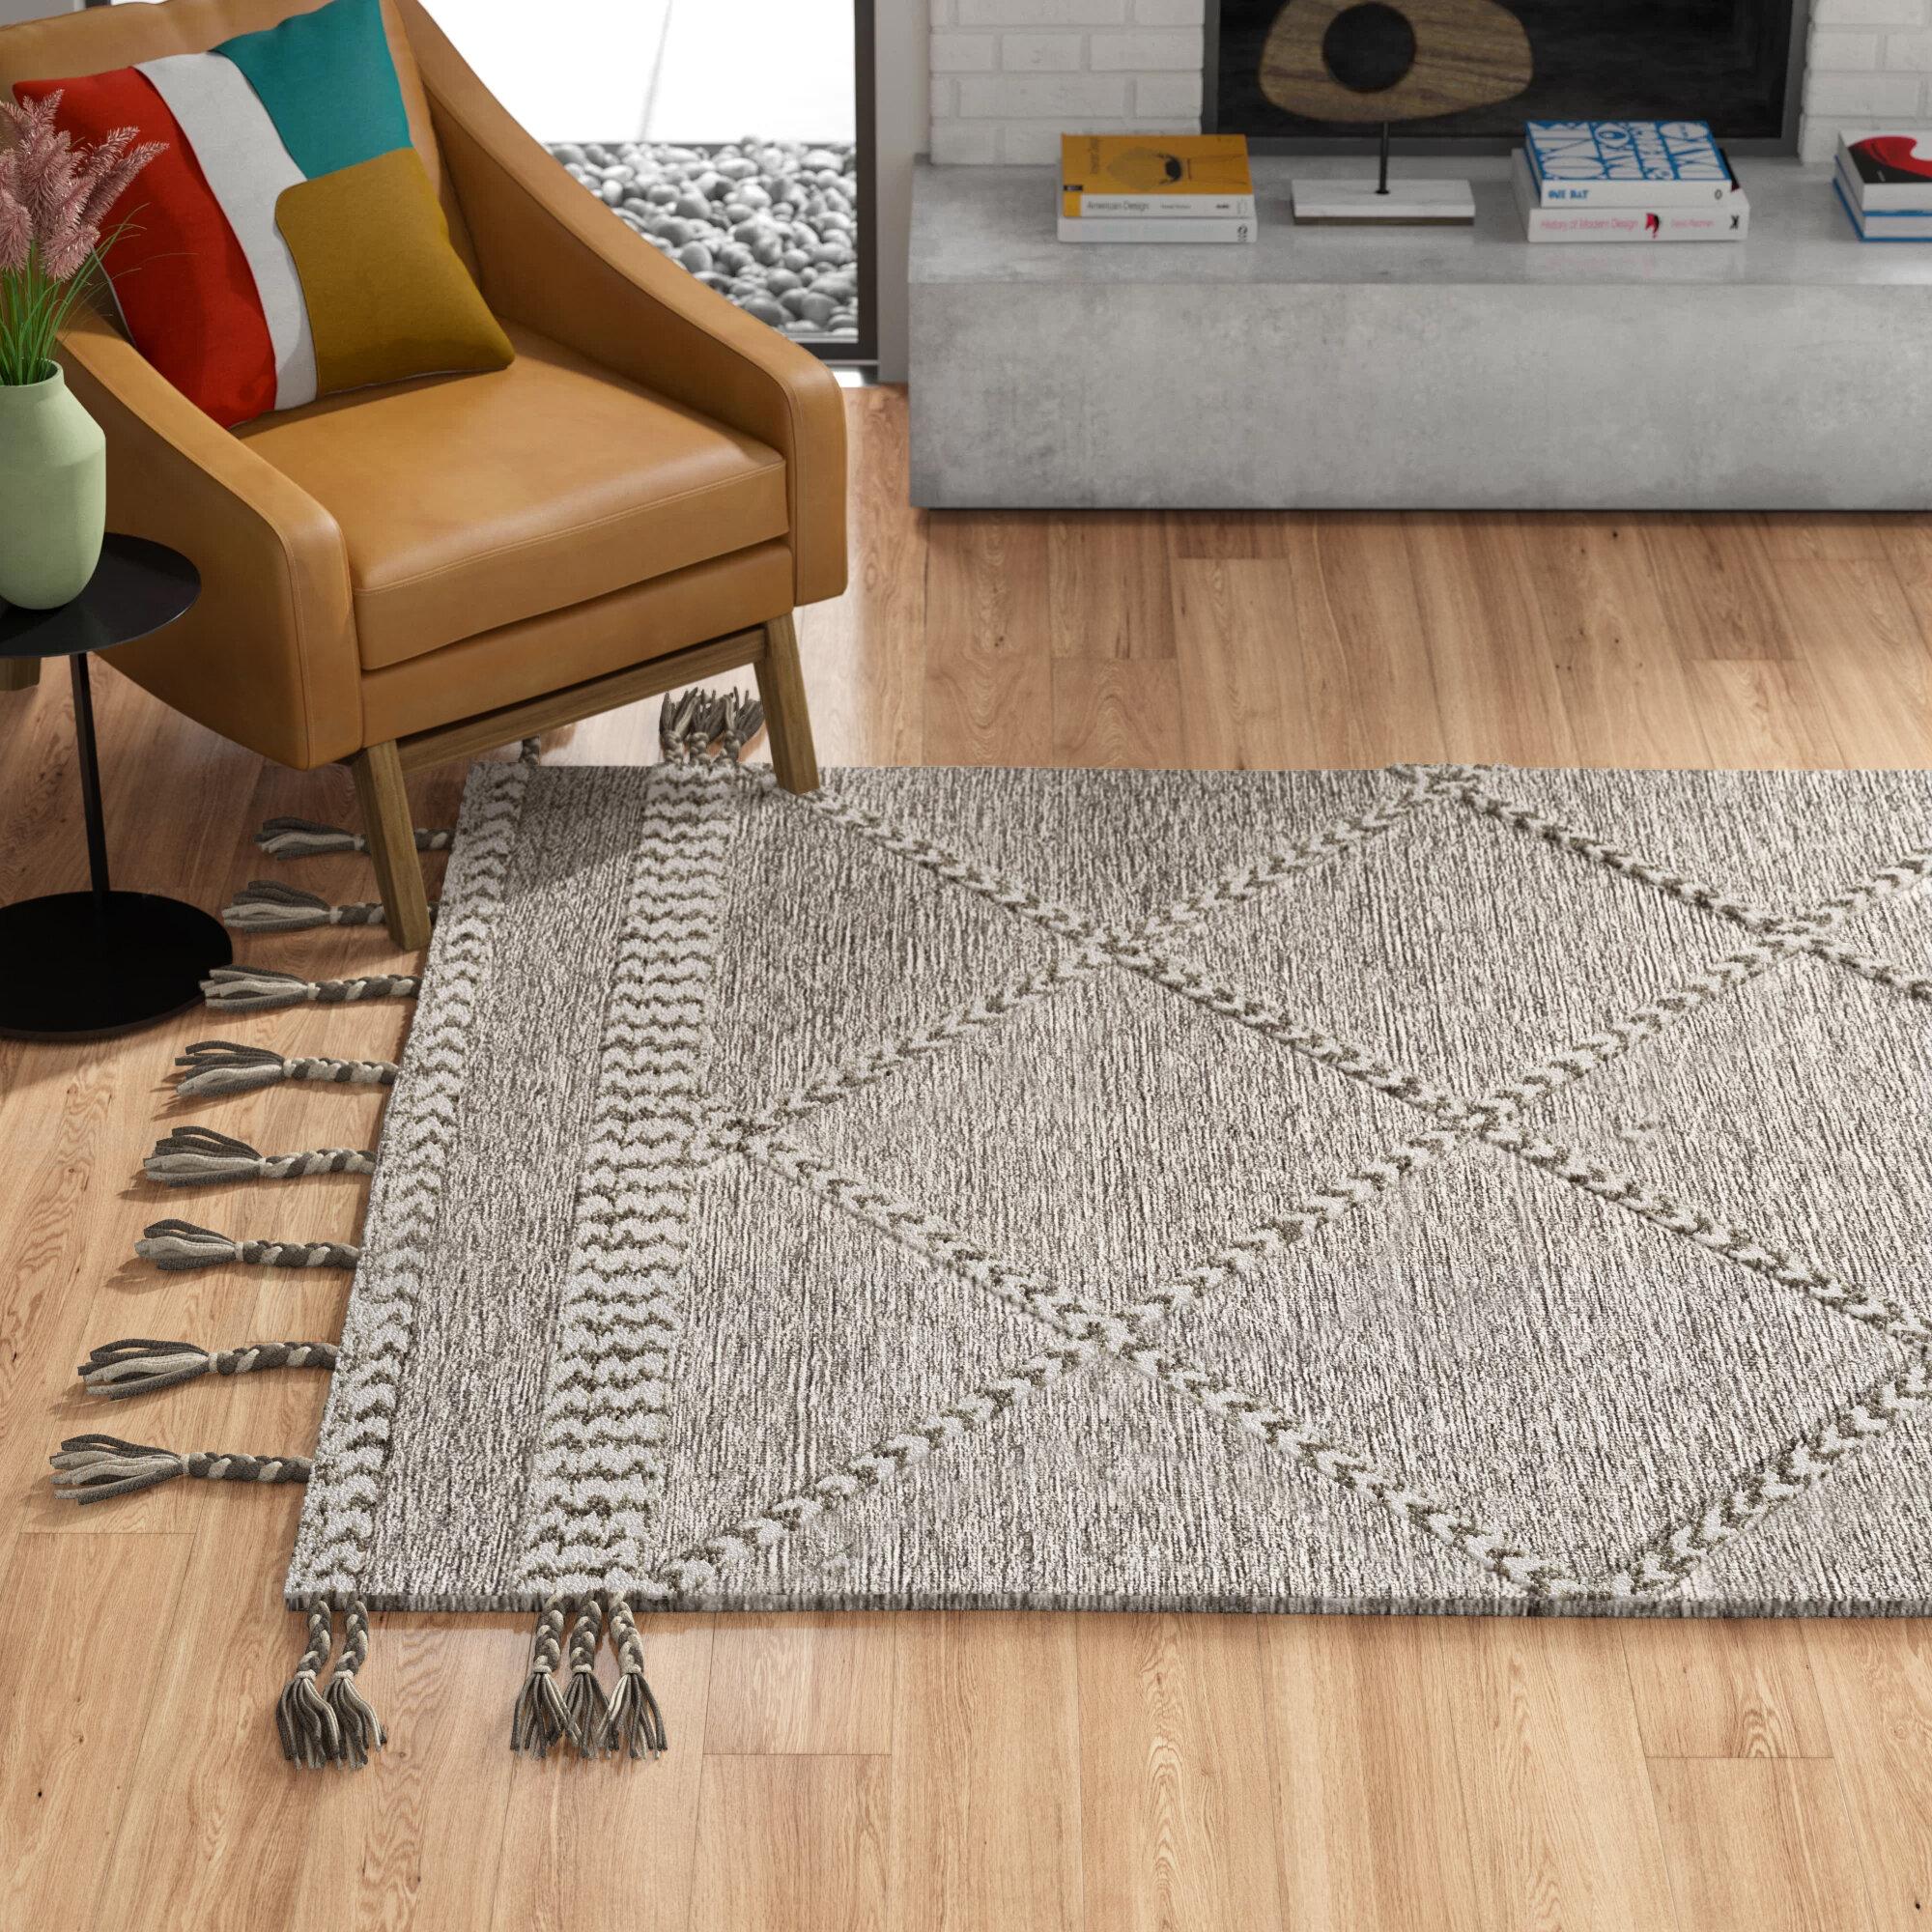 Dade Oriental Handmade Tufted Wool Gray Area Rug Reviews Allmodern